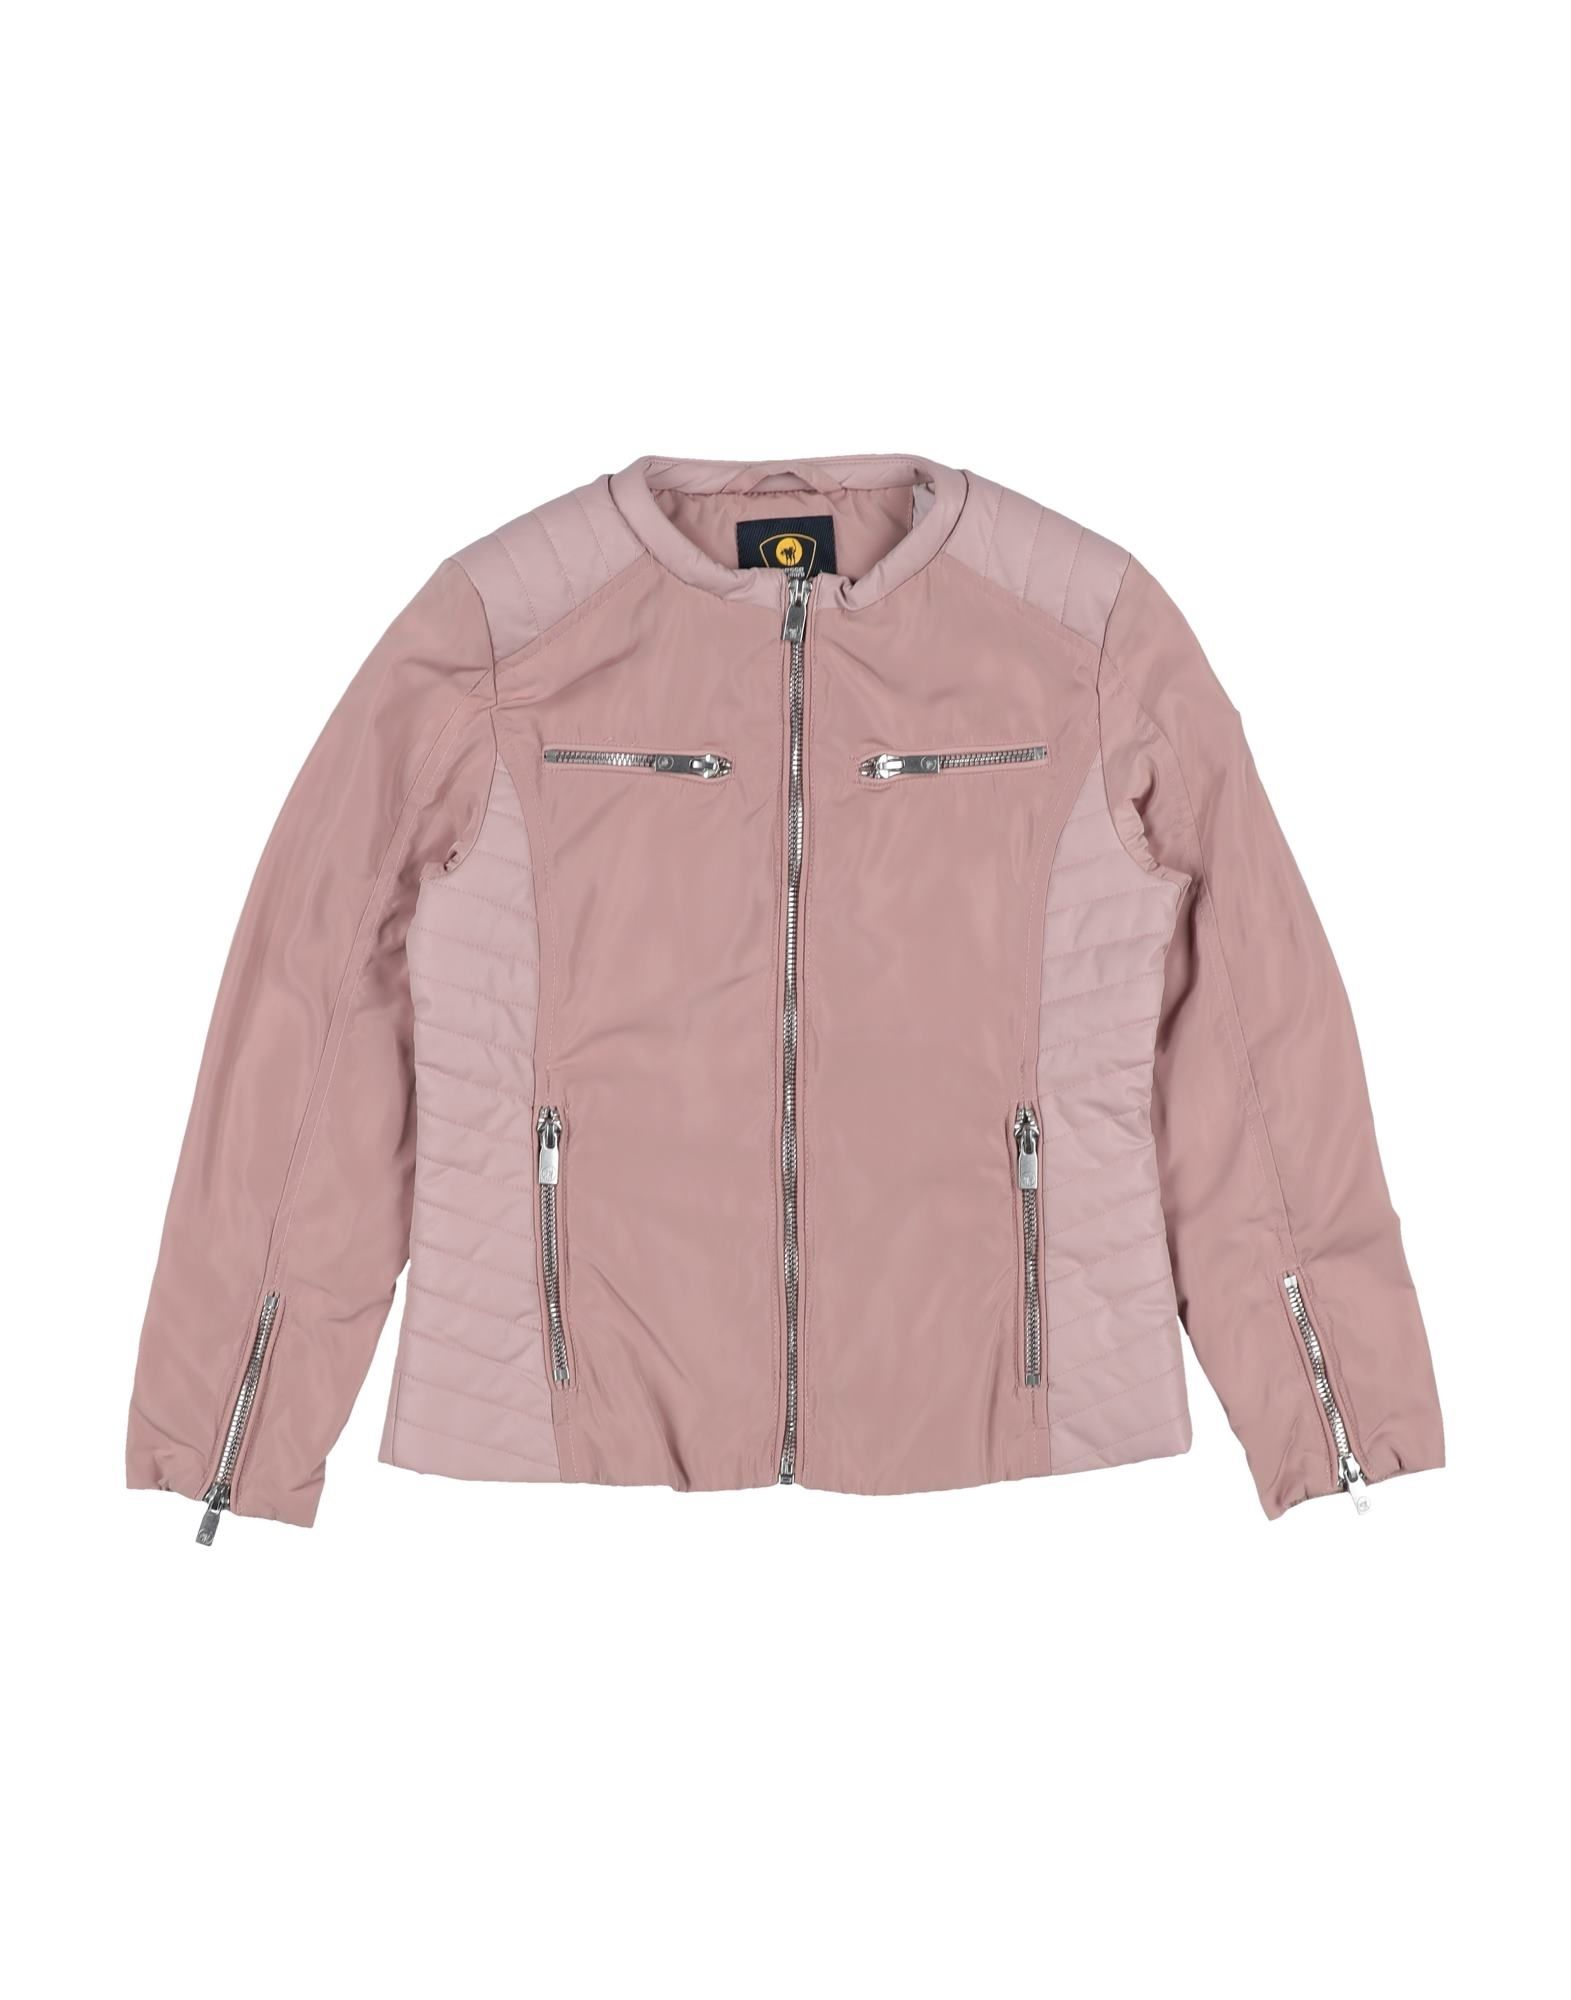 nuovo concetto dd401 550d4 CIESSE PIUMINI Jacket - Coats & Jackets | YOOX.COM